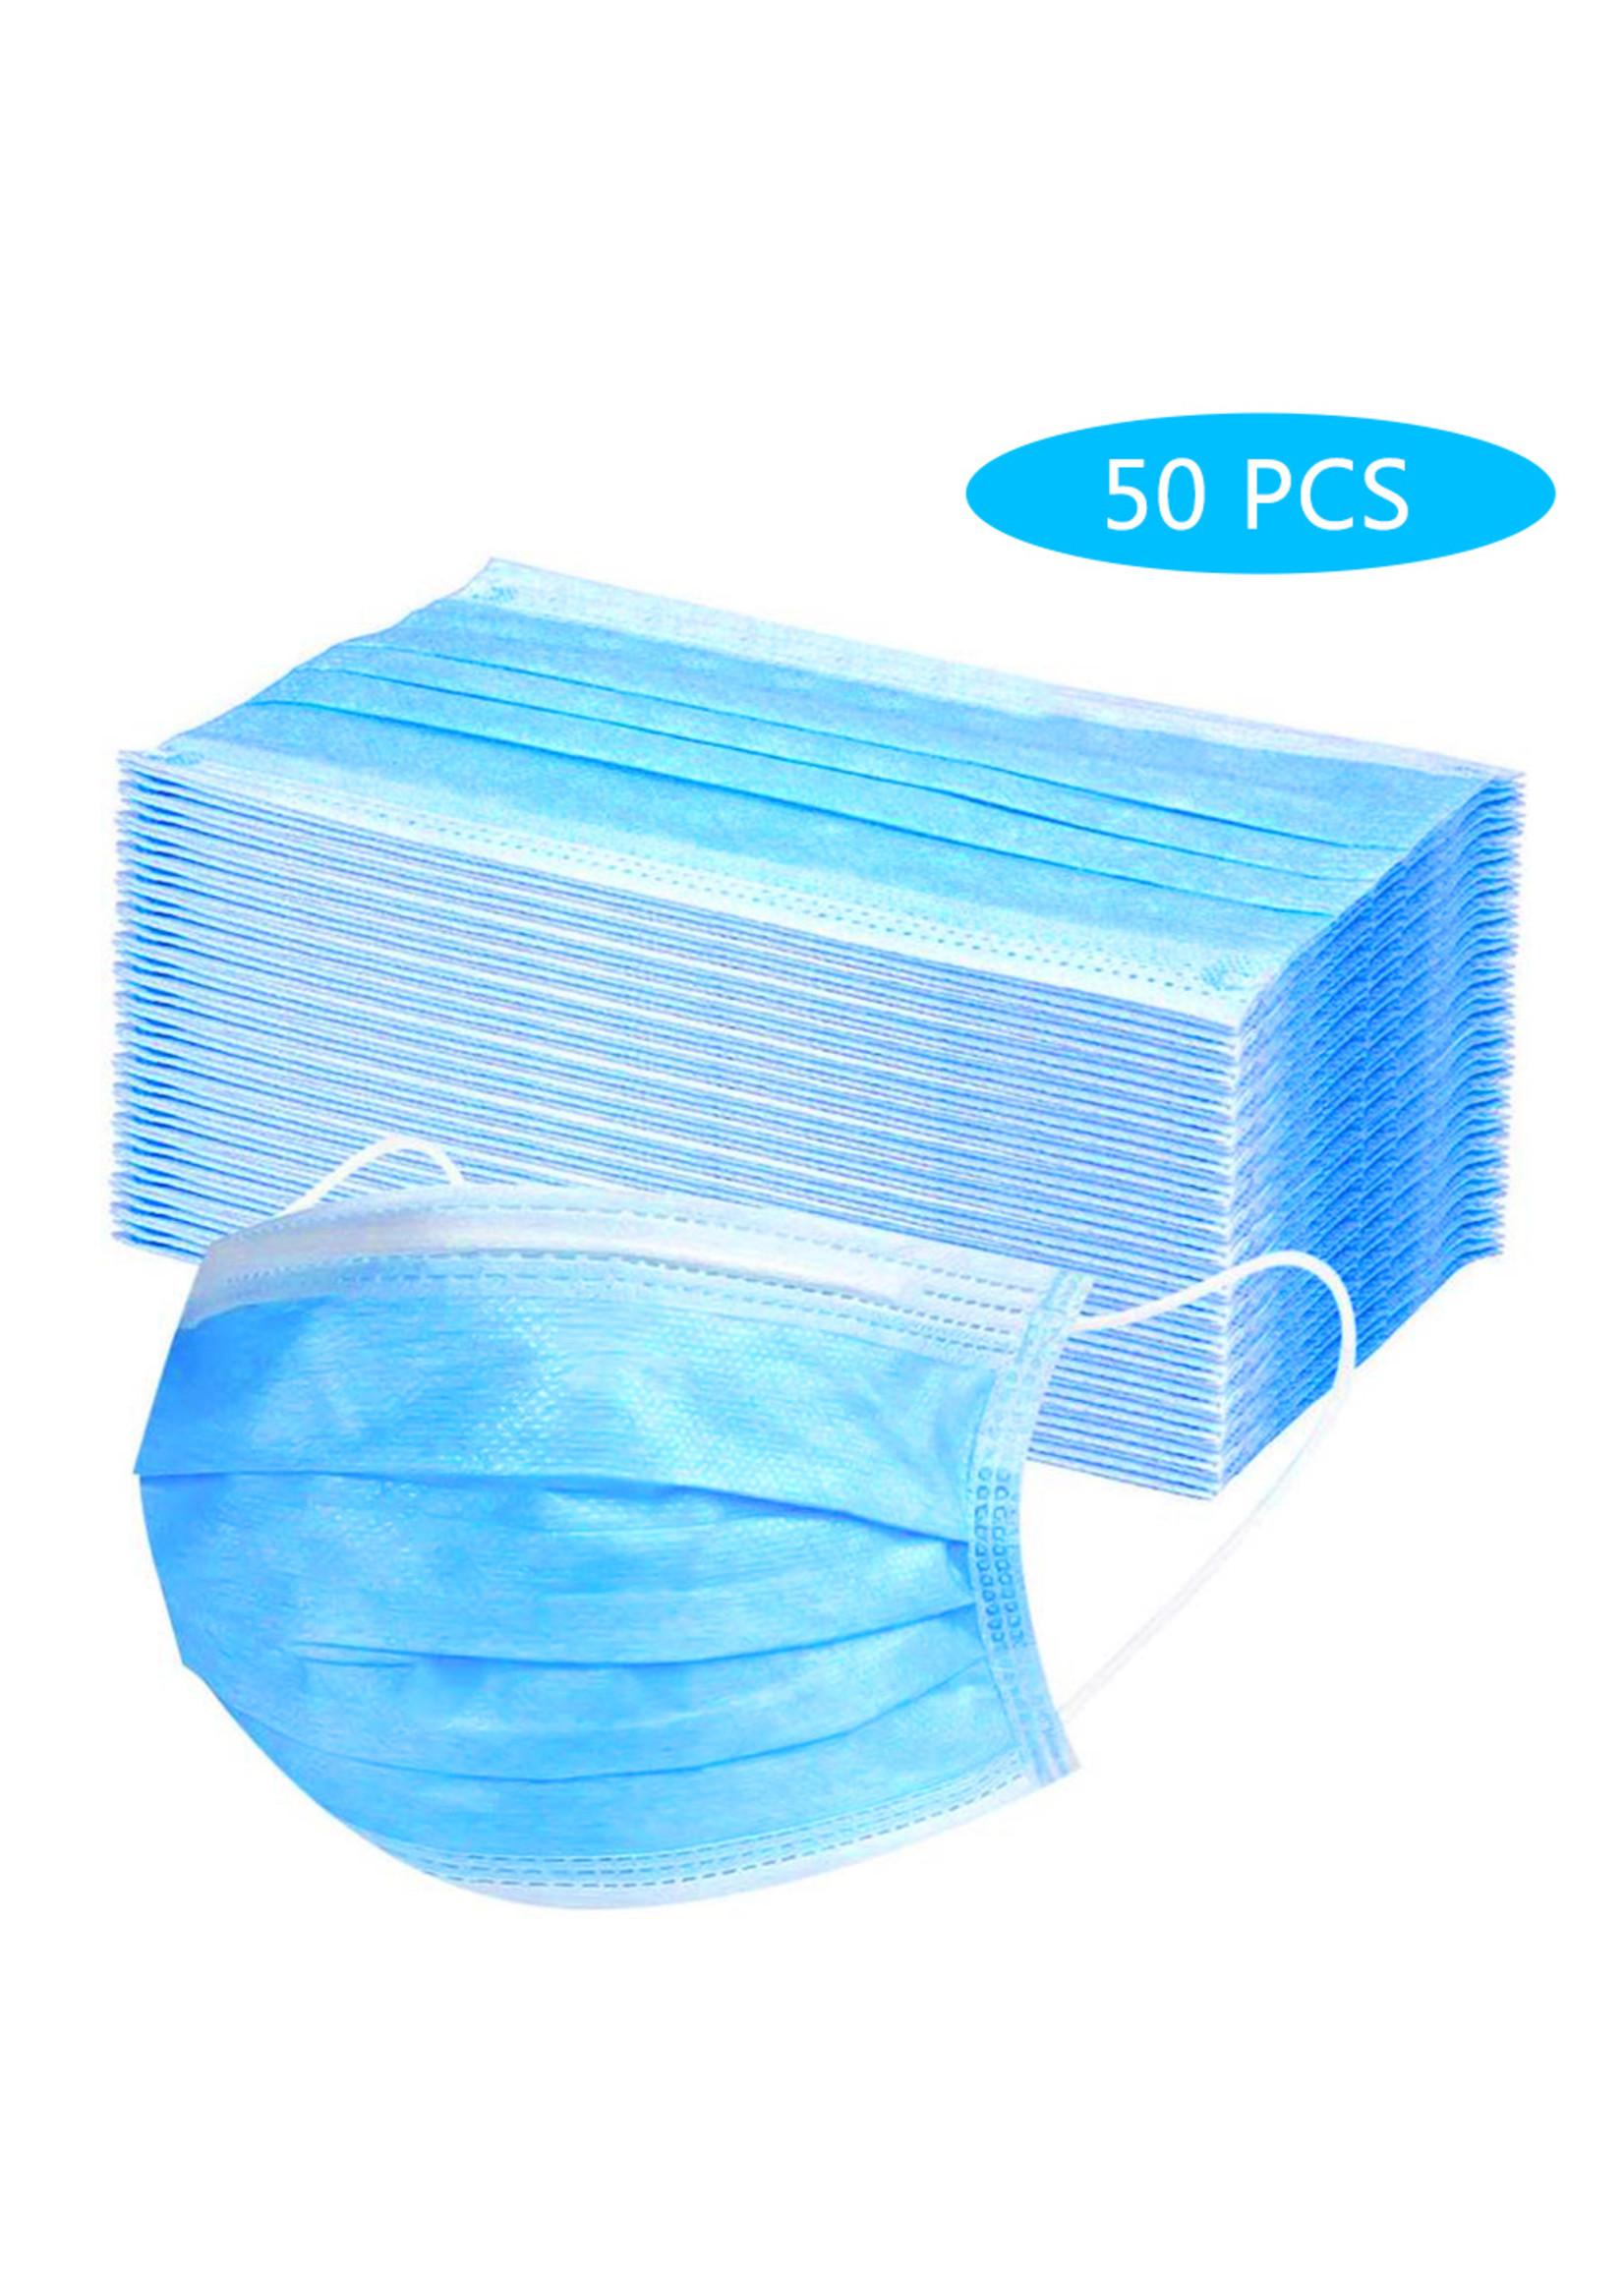 50PCS Disposable Face Mask 4 Layers